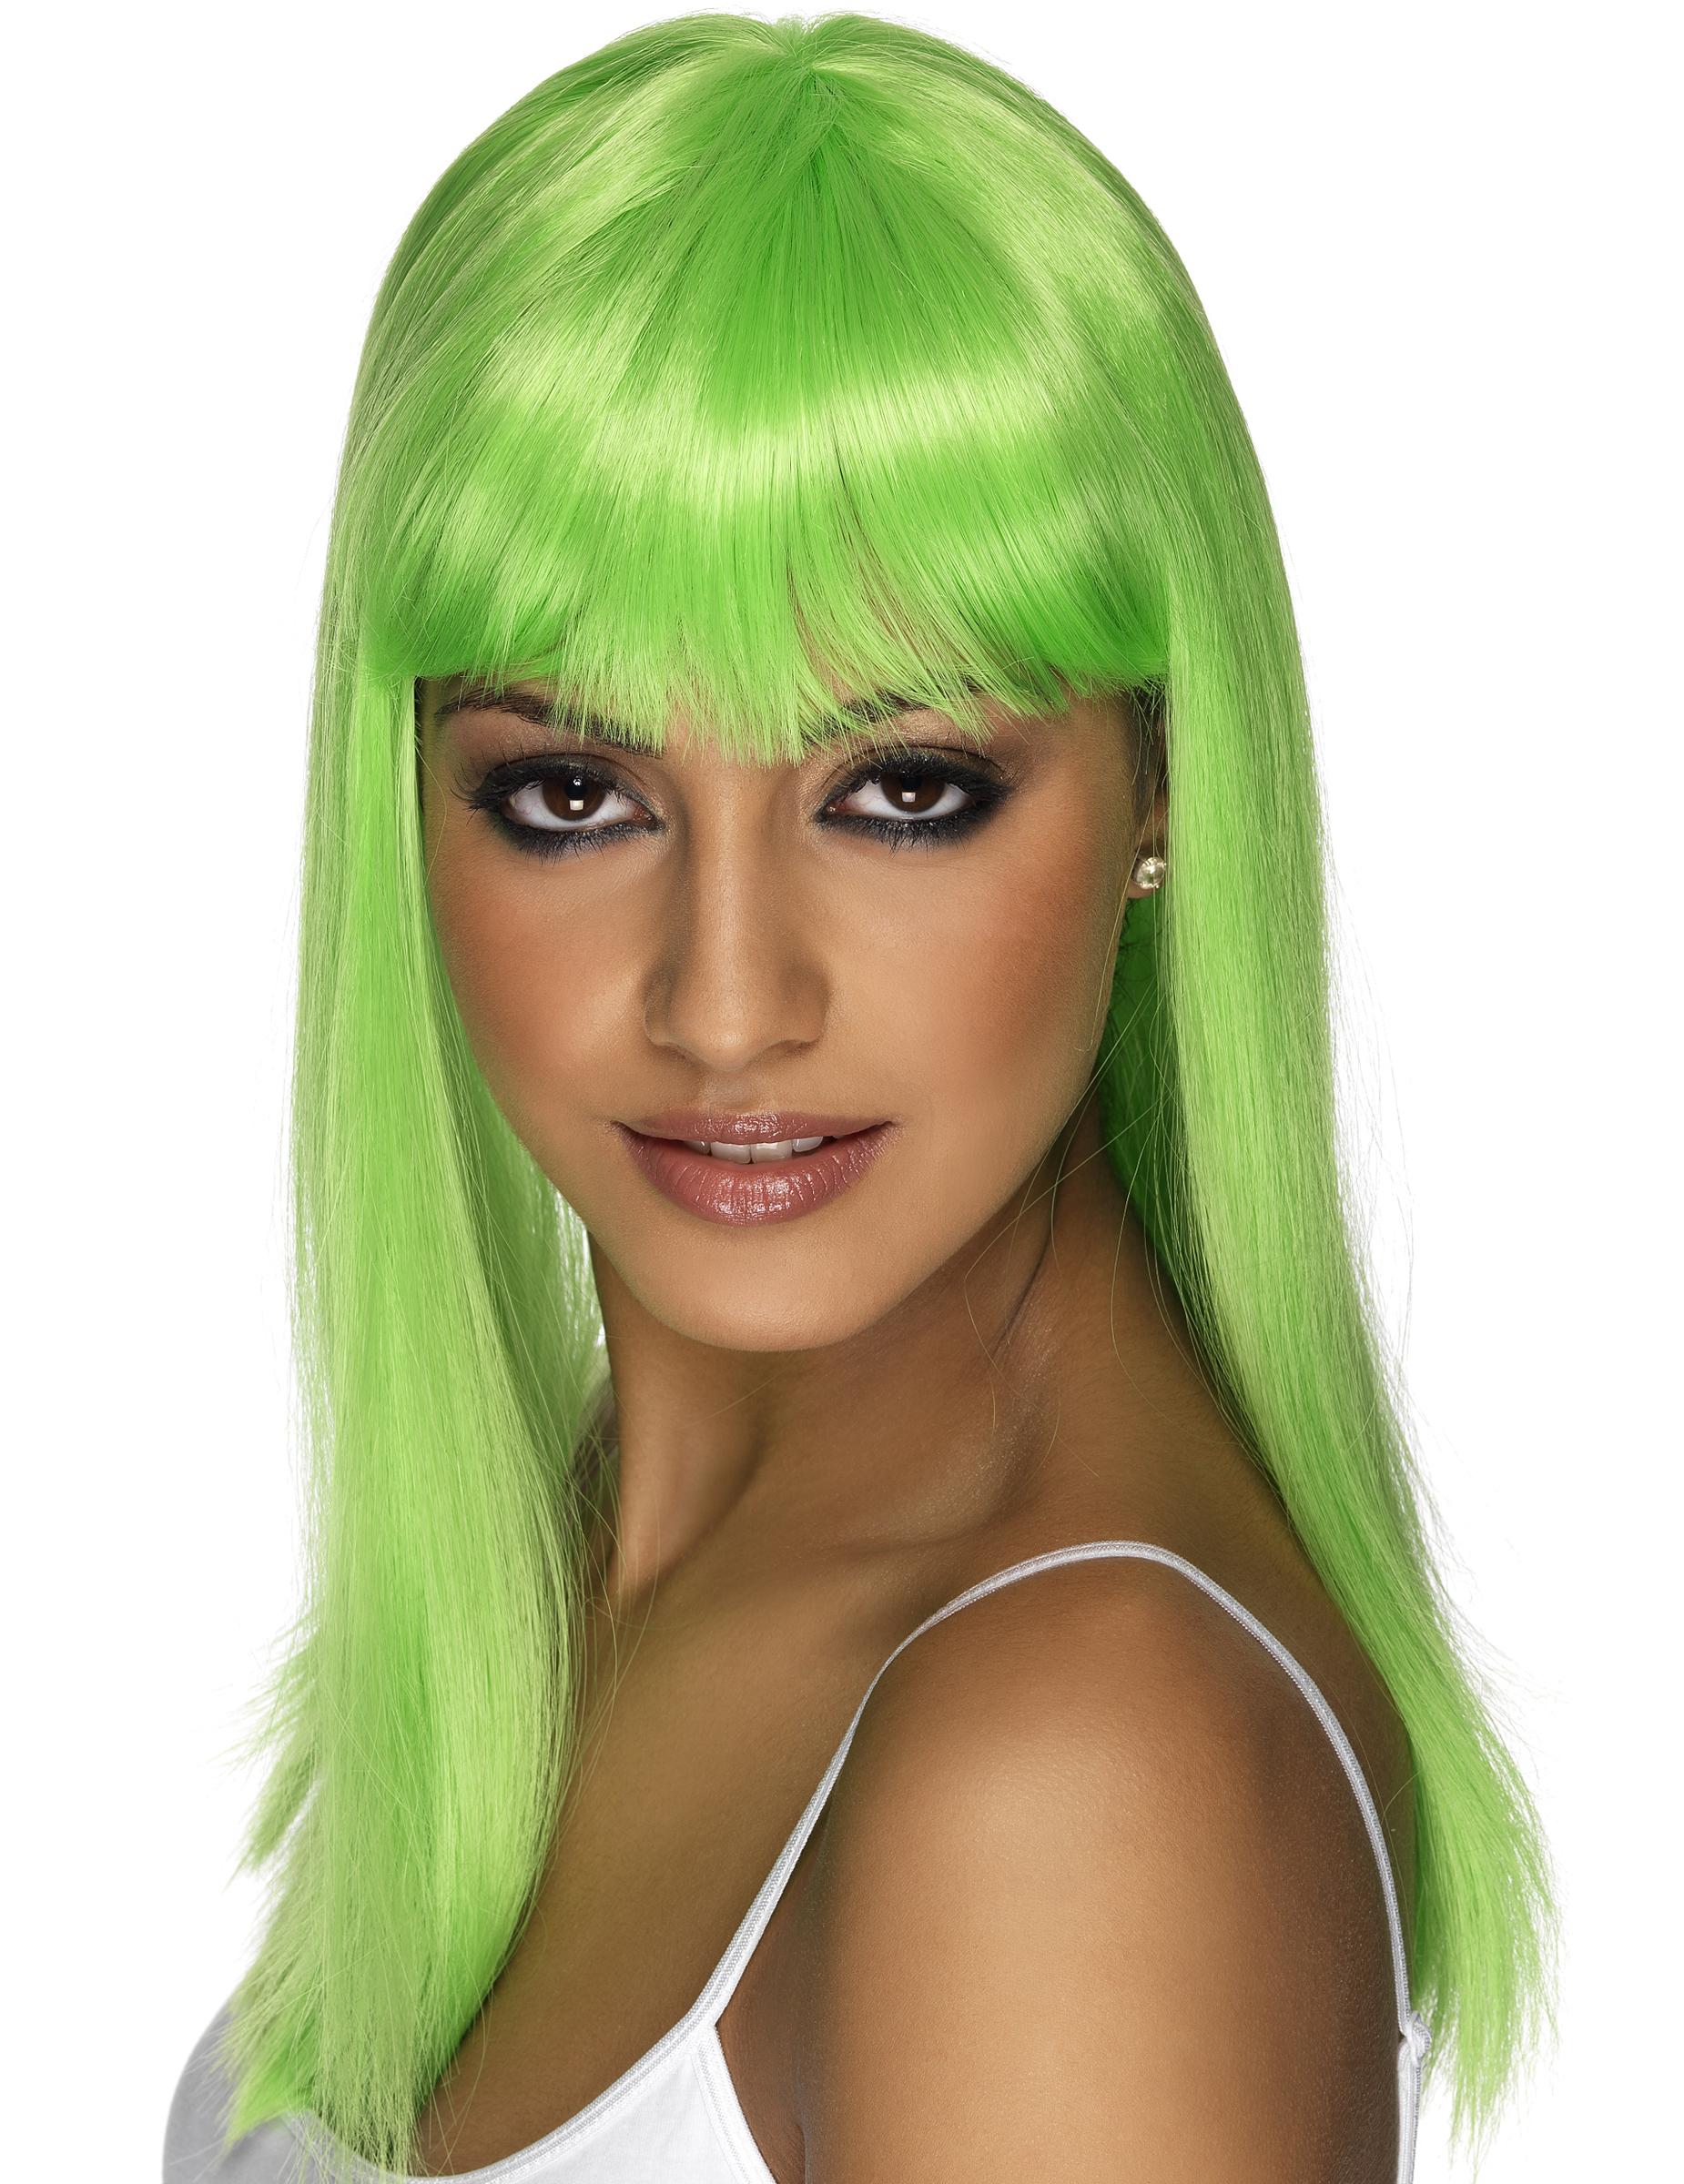 477eac059 Peluca verde con glamour para mujer